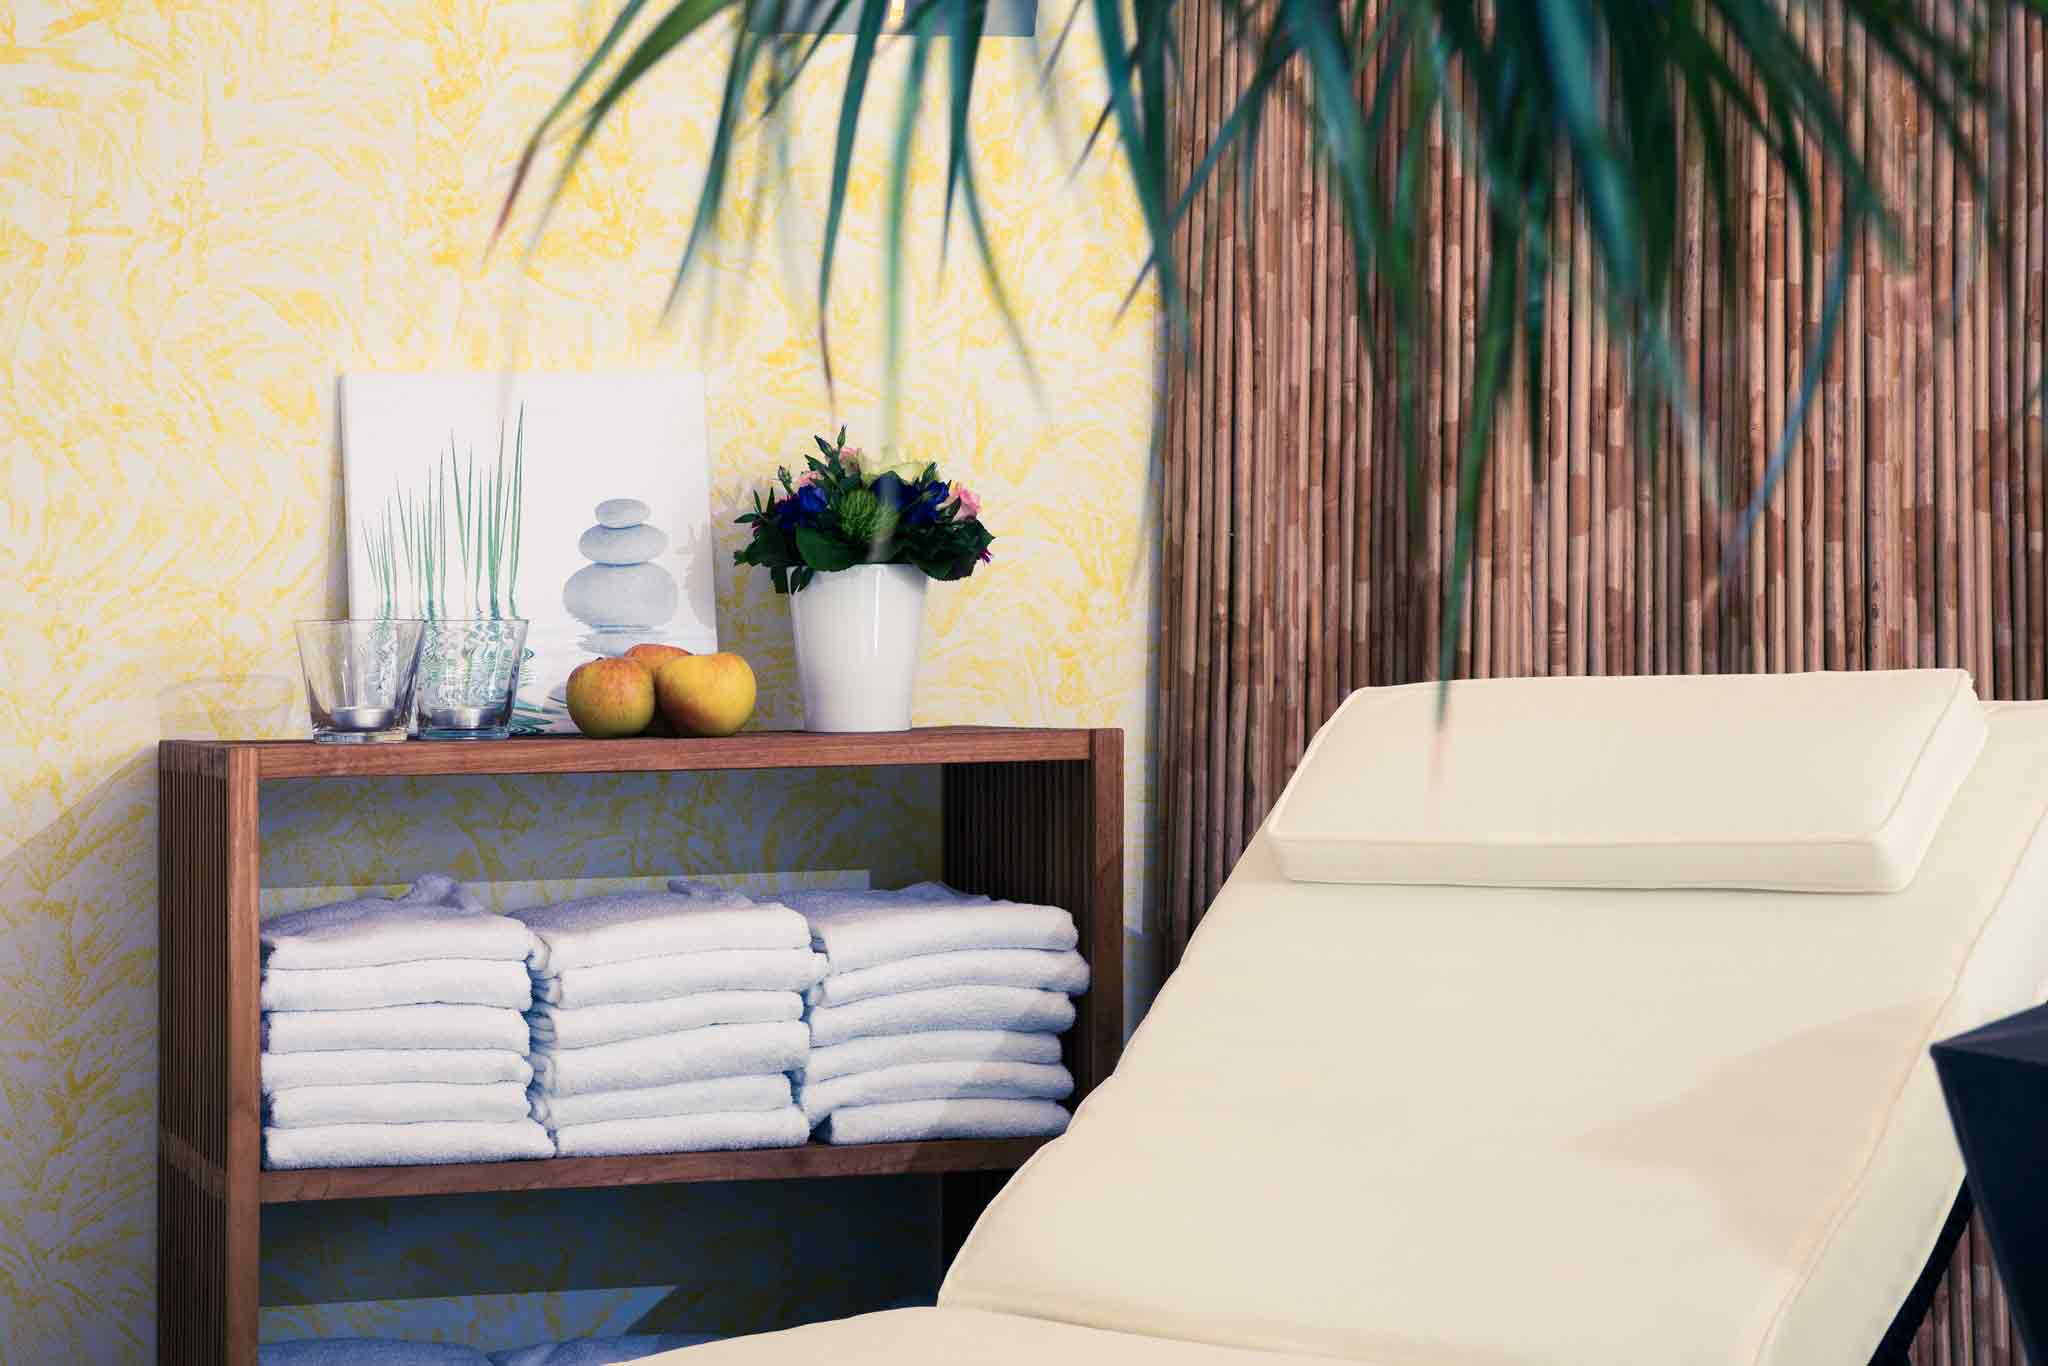 Mercure Hotel Bad Oeynhausen City Wellness area